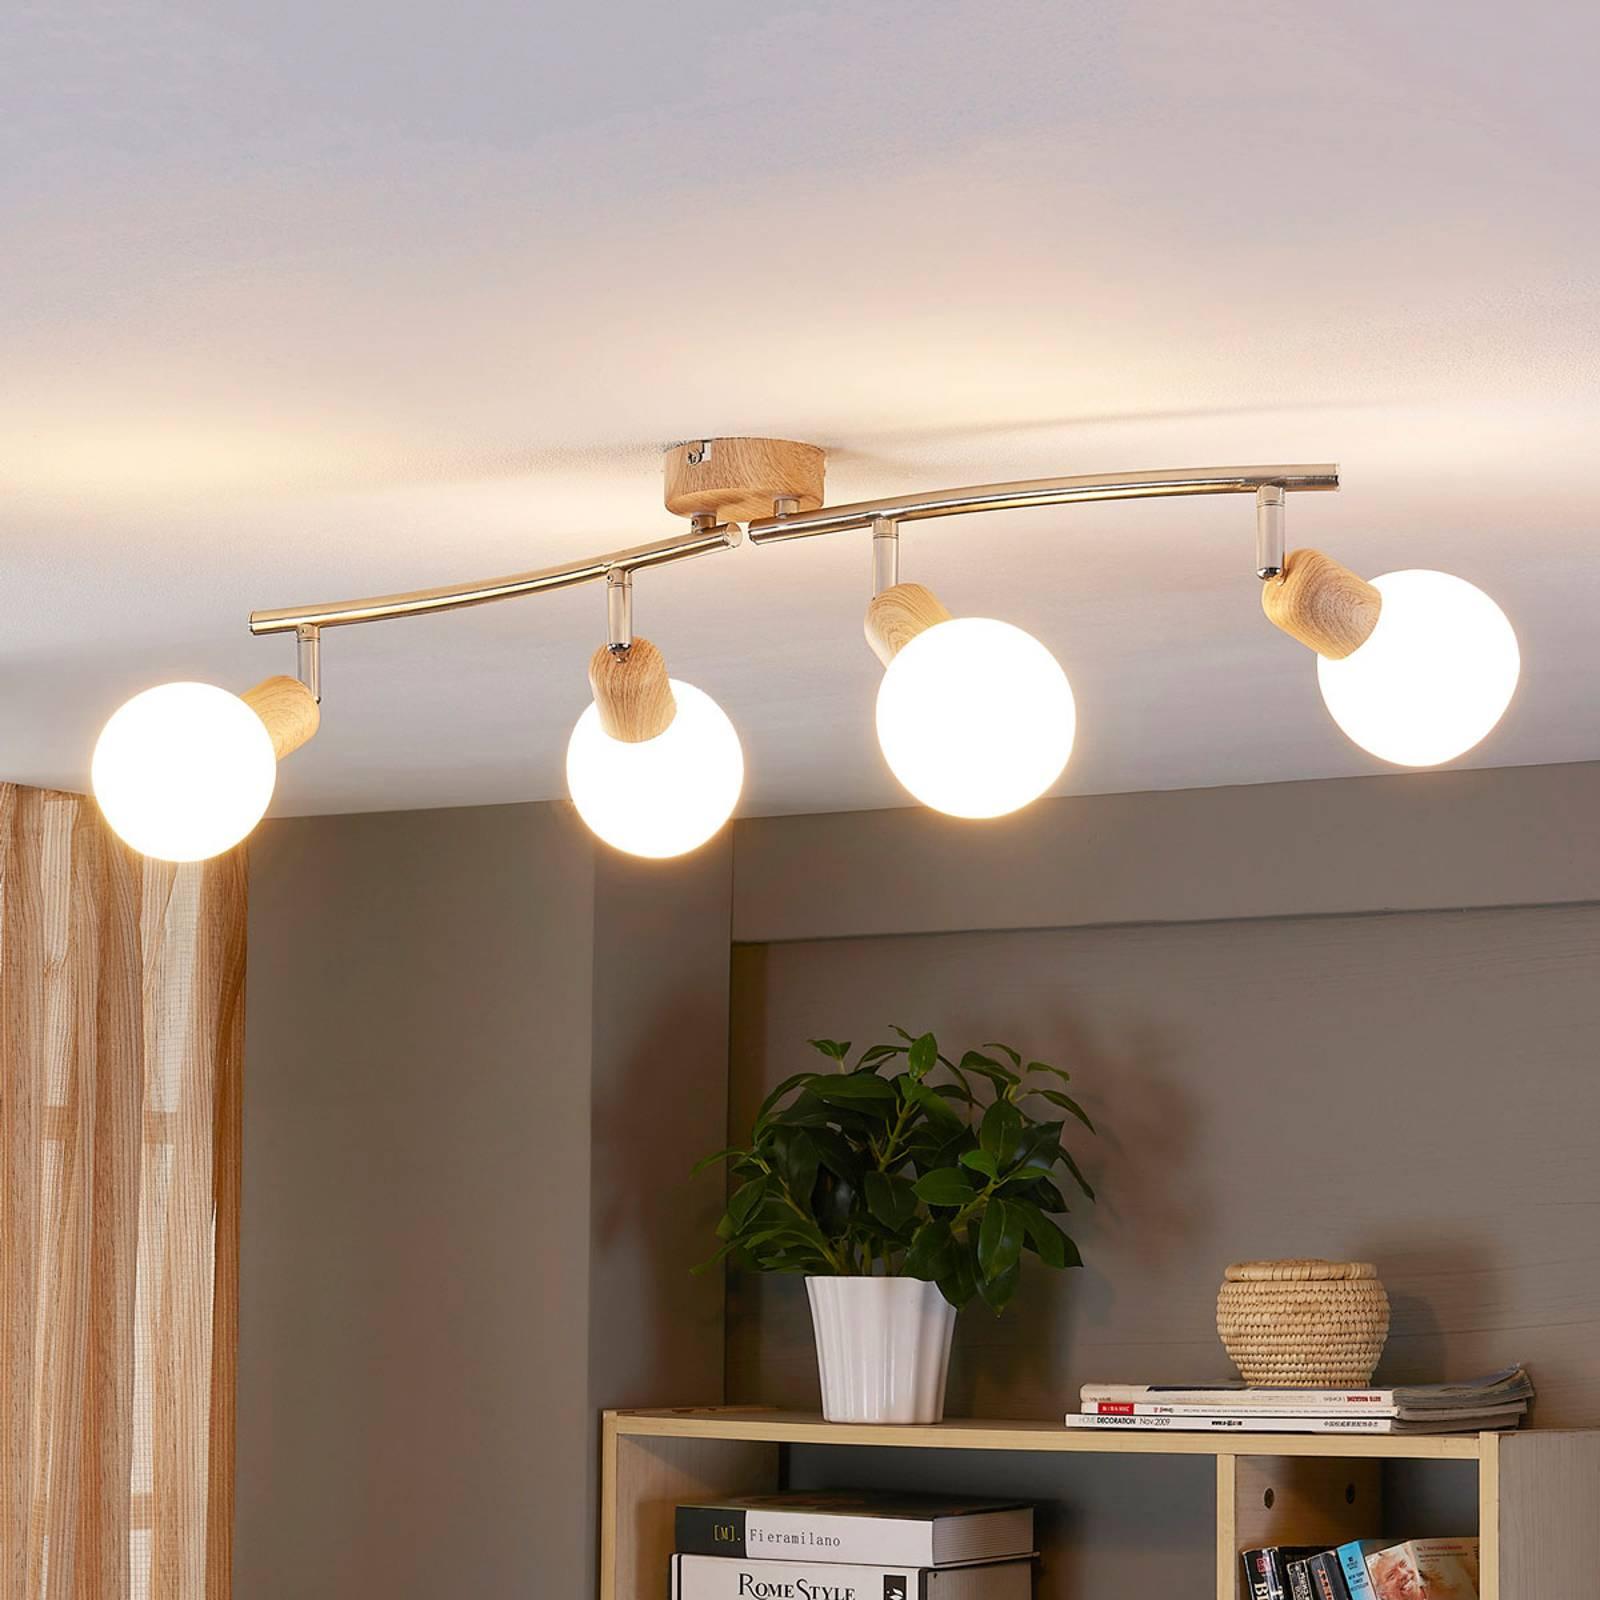 4-lamppuinen LED-kohdevalo Svenka, puupinta